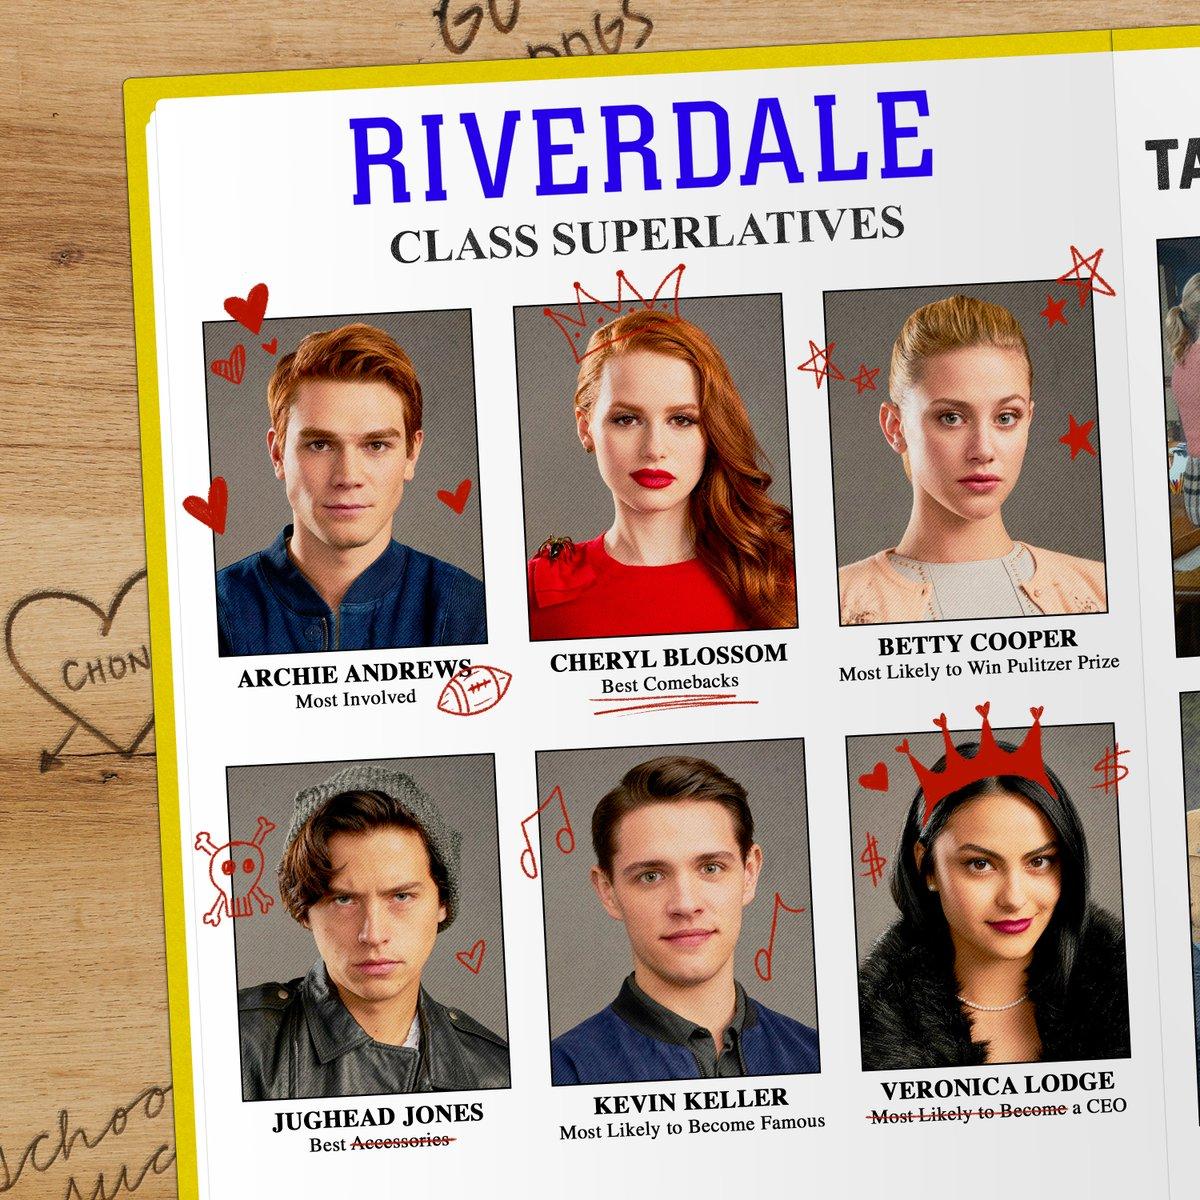 Not your regular high school #Riverdale